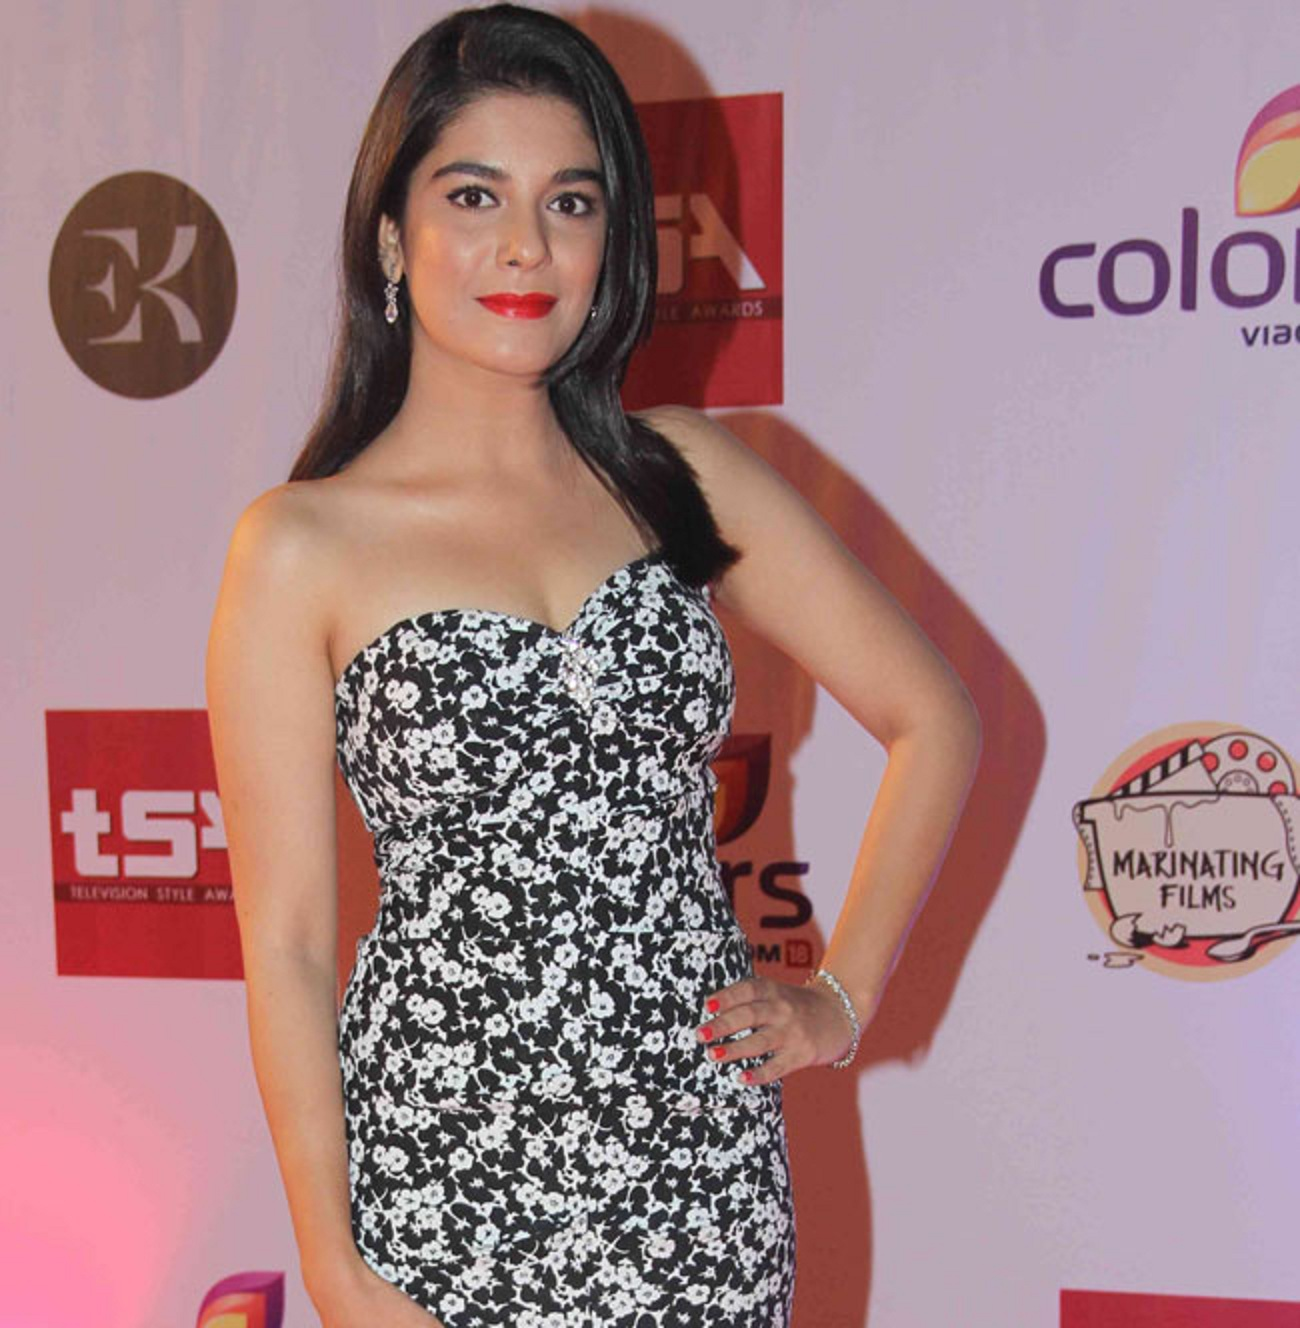 Pooja Gaur HD Wallpapers Free Download -I-